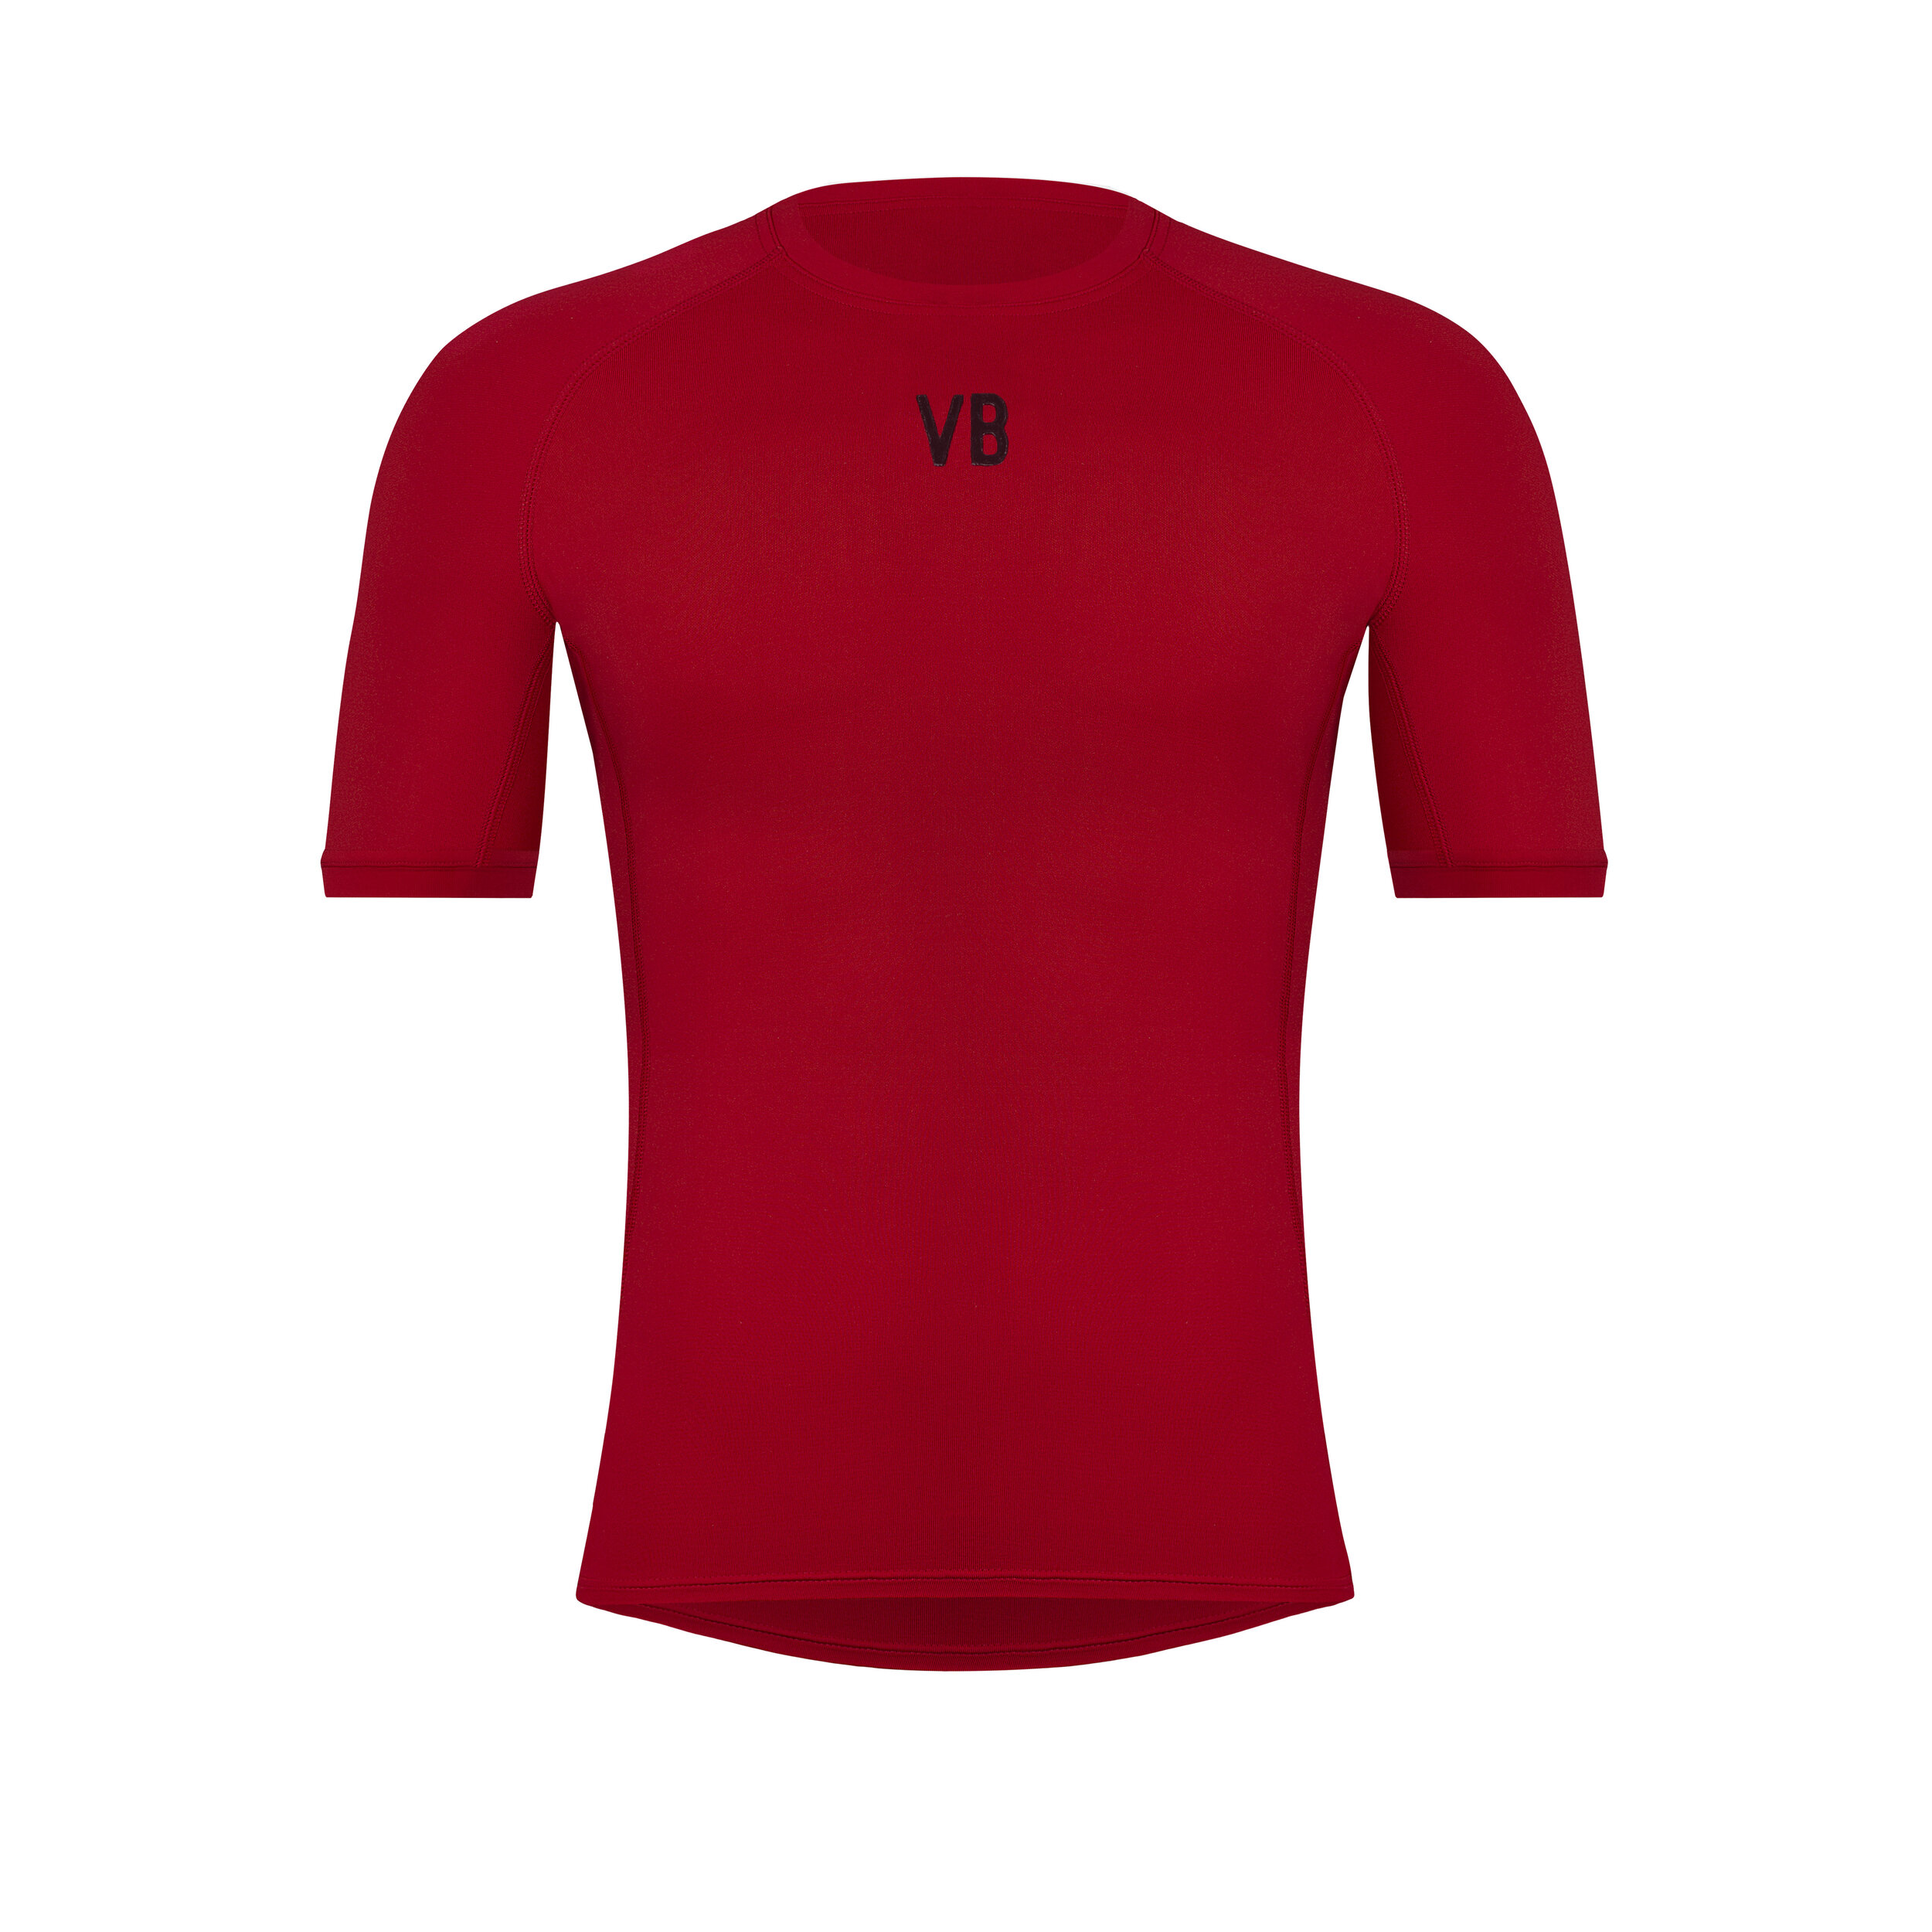 Velobici-Velvet-Short-Sleeve-Thermal-Cycling-Baselayer-Front.jpg